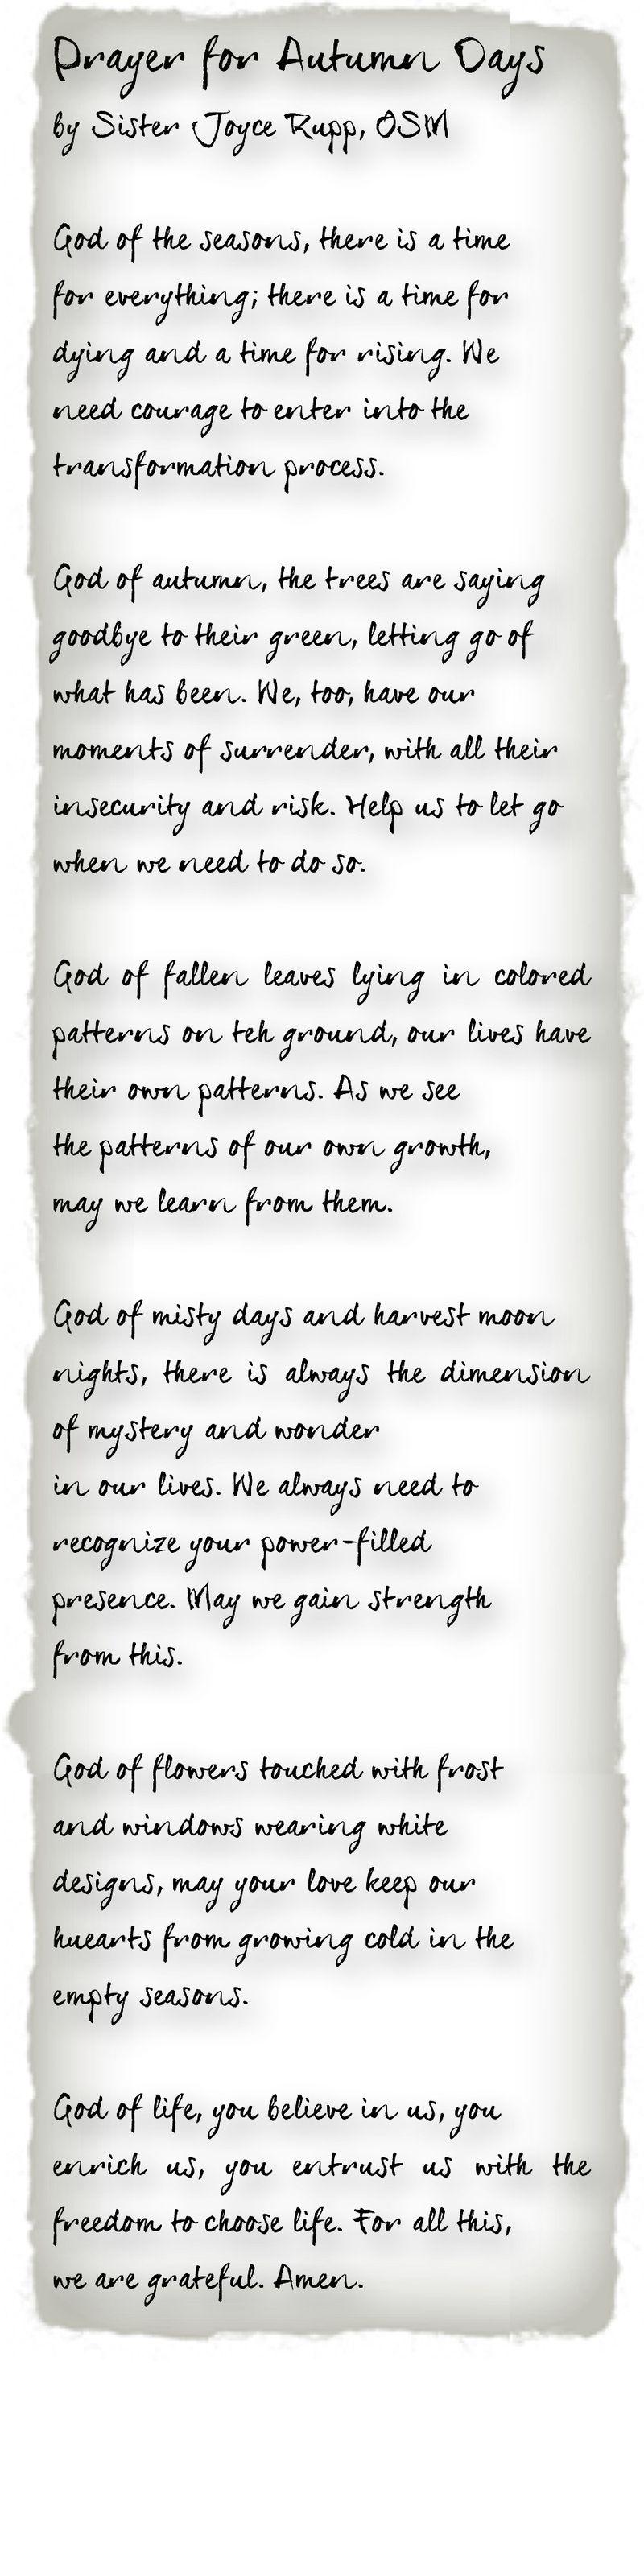 Blog prayer for autumn days